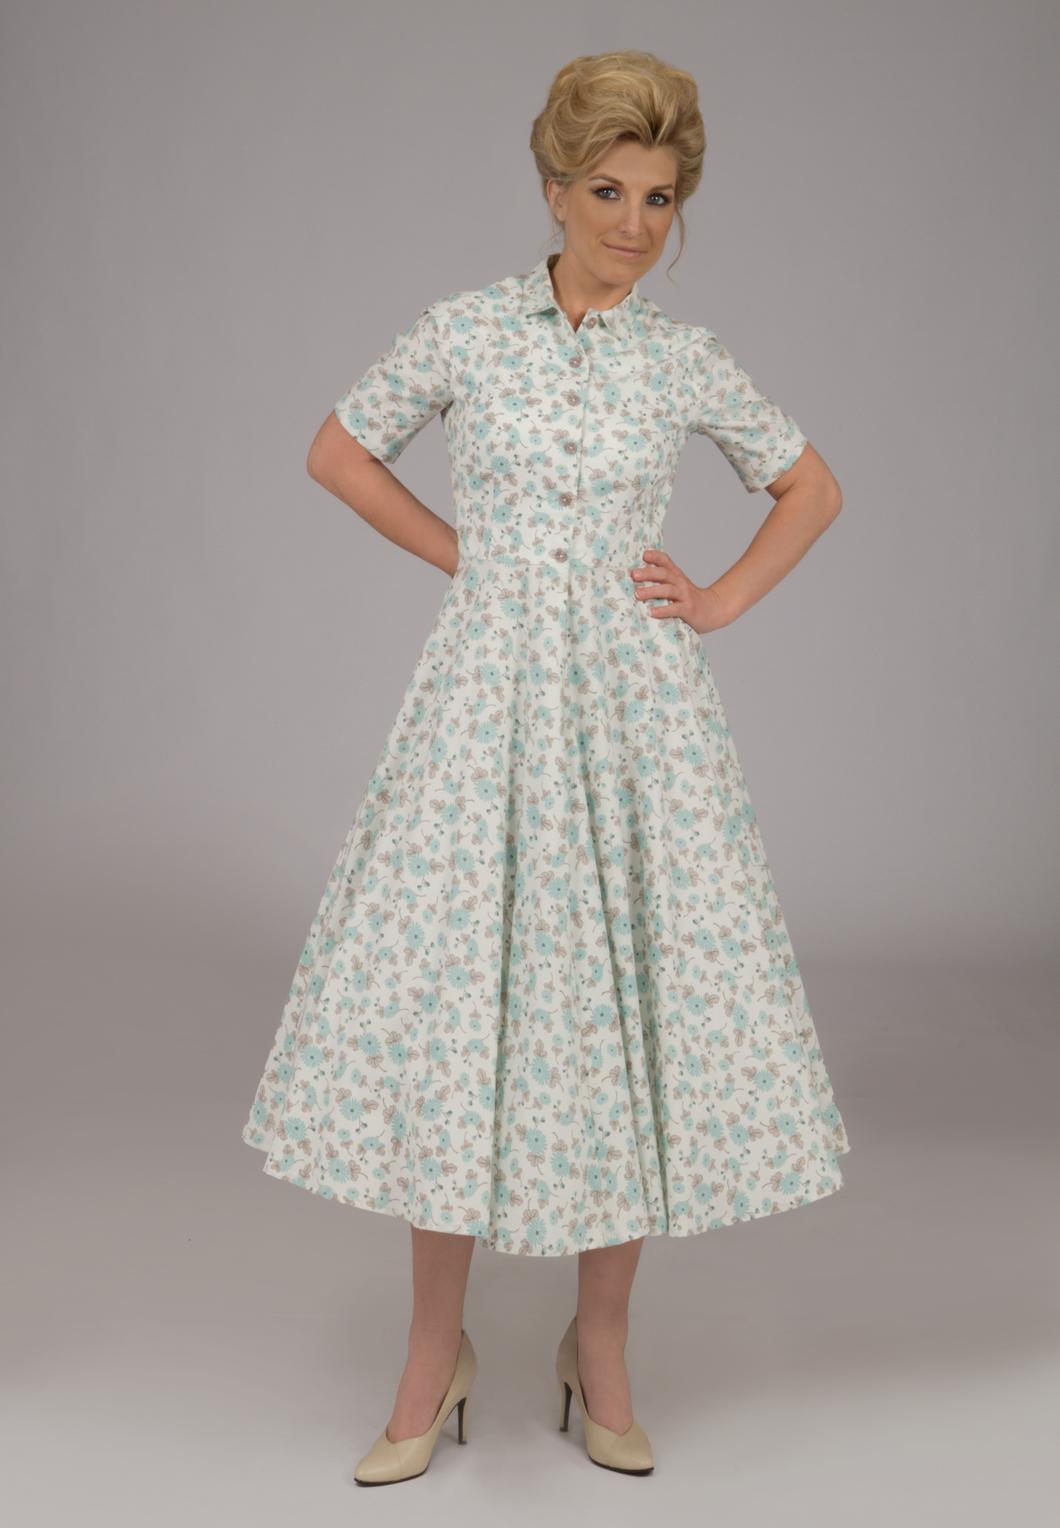 Vera Retro 1950s Dress